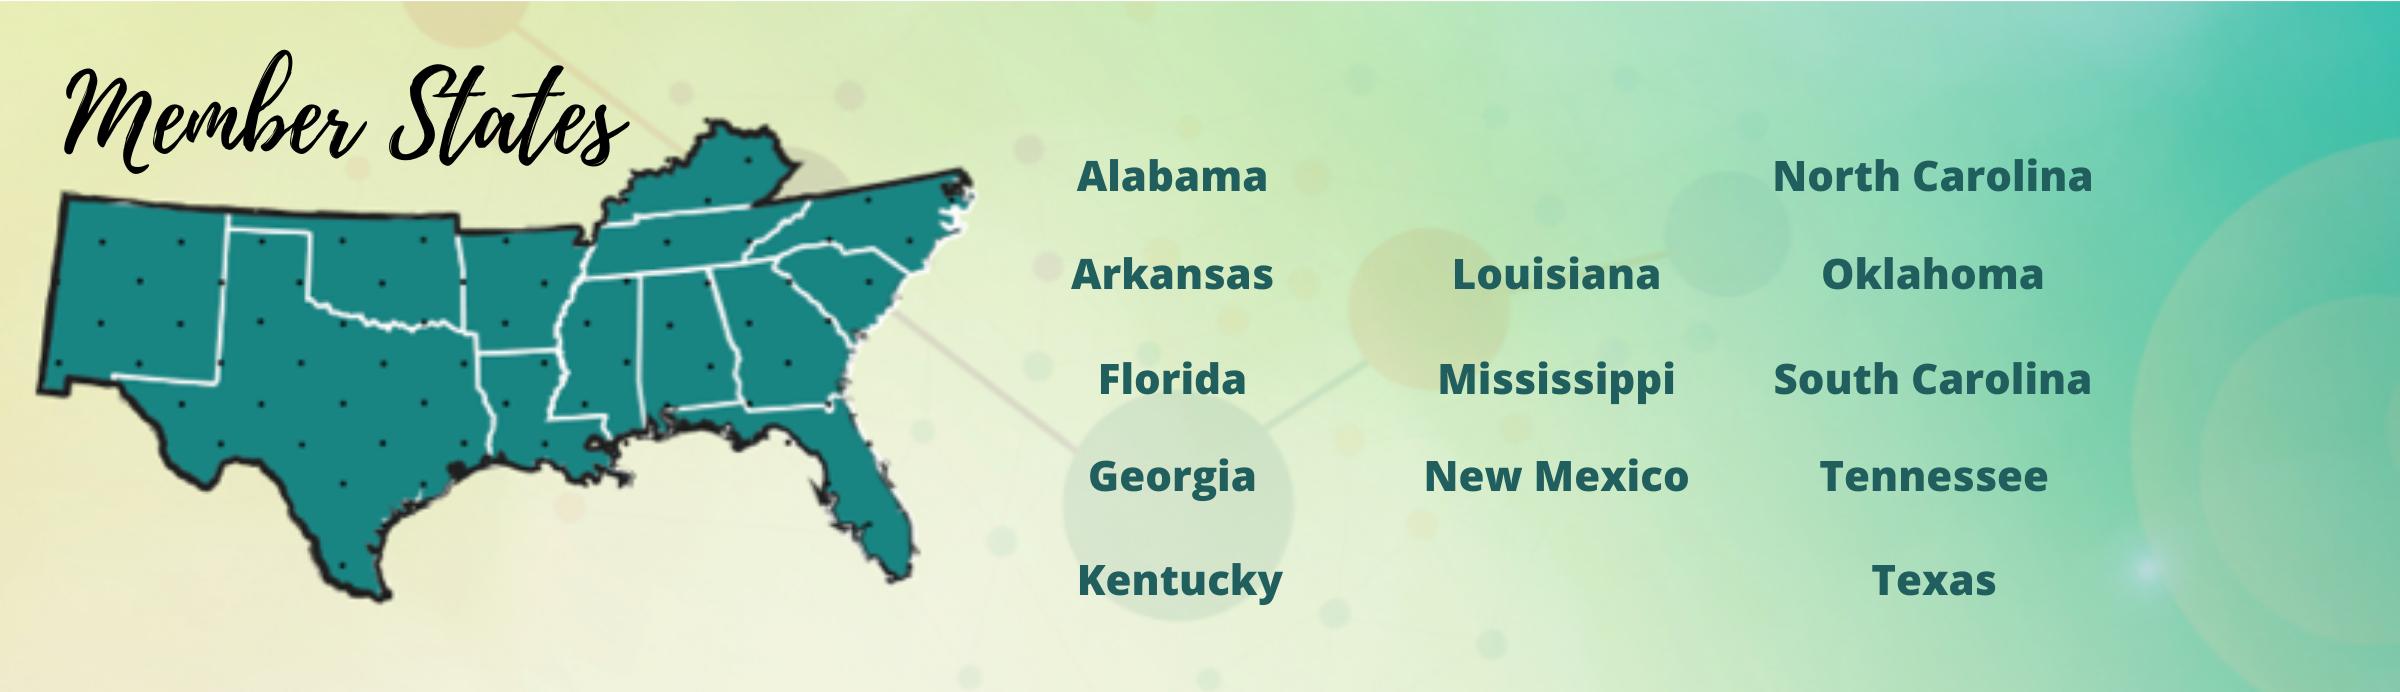 US map on the left with the header Member States. List of member states including: Alabama, Arkansas, Florida, Georgia, Kentucky, Louisiana, Mississippi, New Mexico, North Carolina, Oklahoma, South Carolina, Tennessee, and Texas.